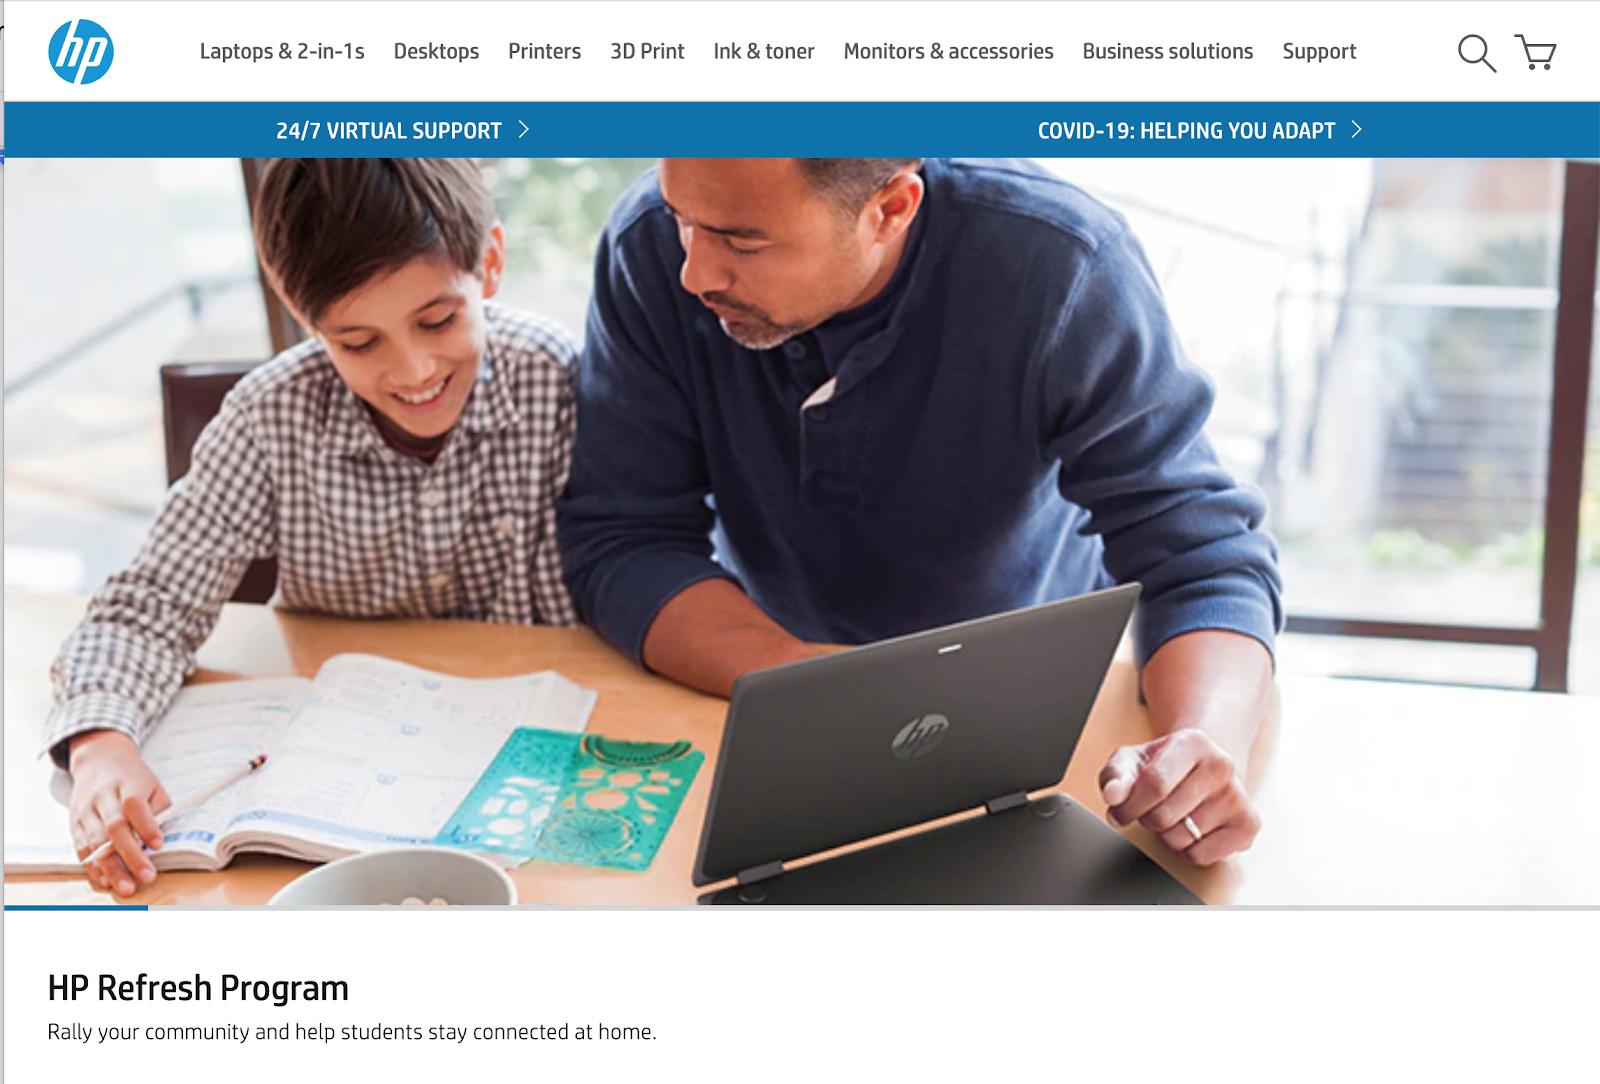 HP Refresh Program